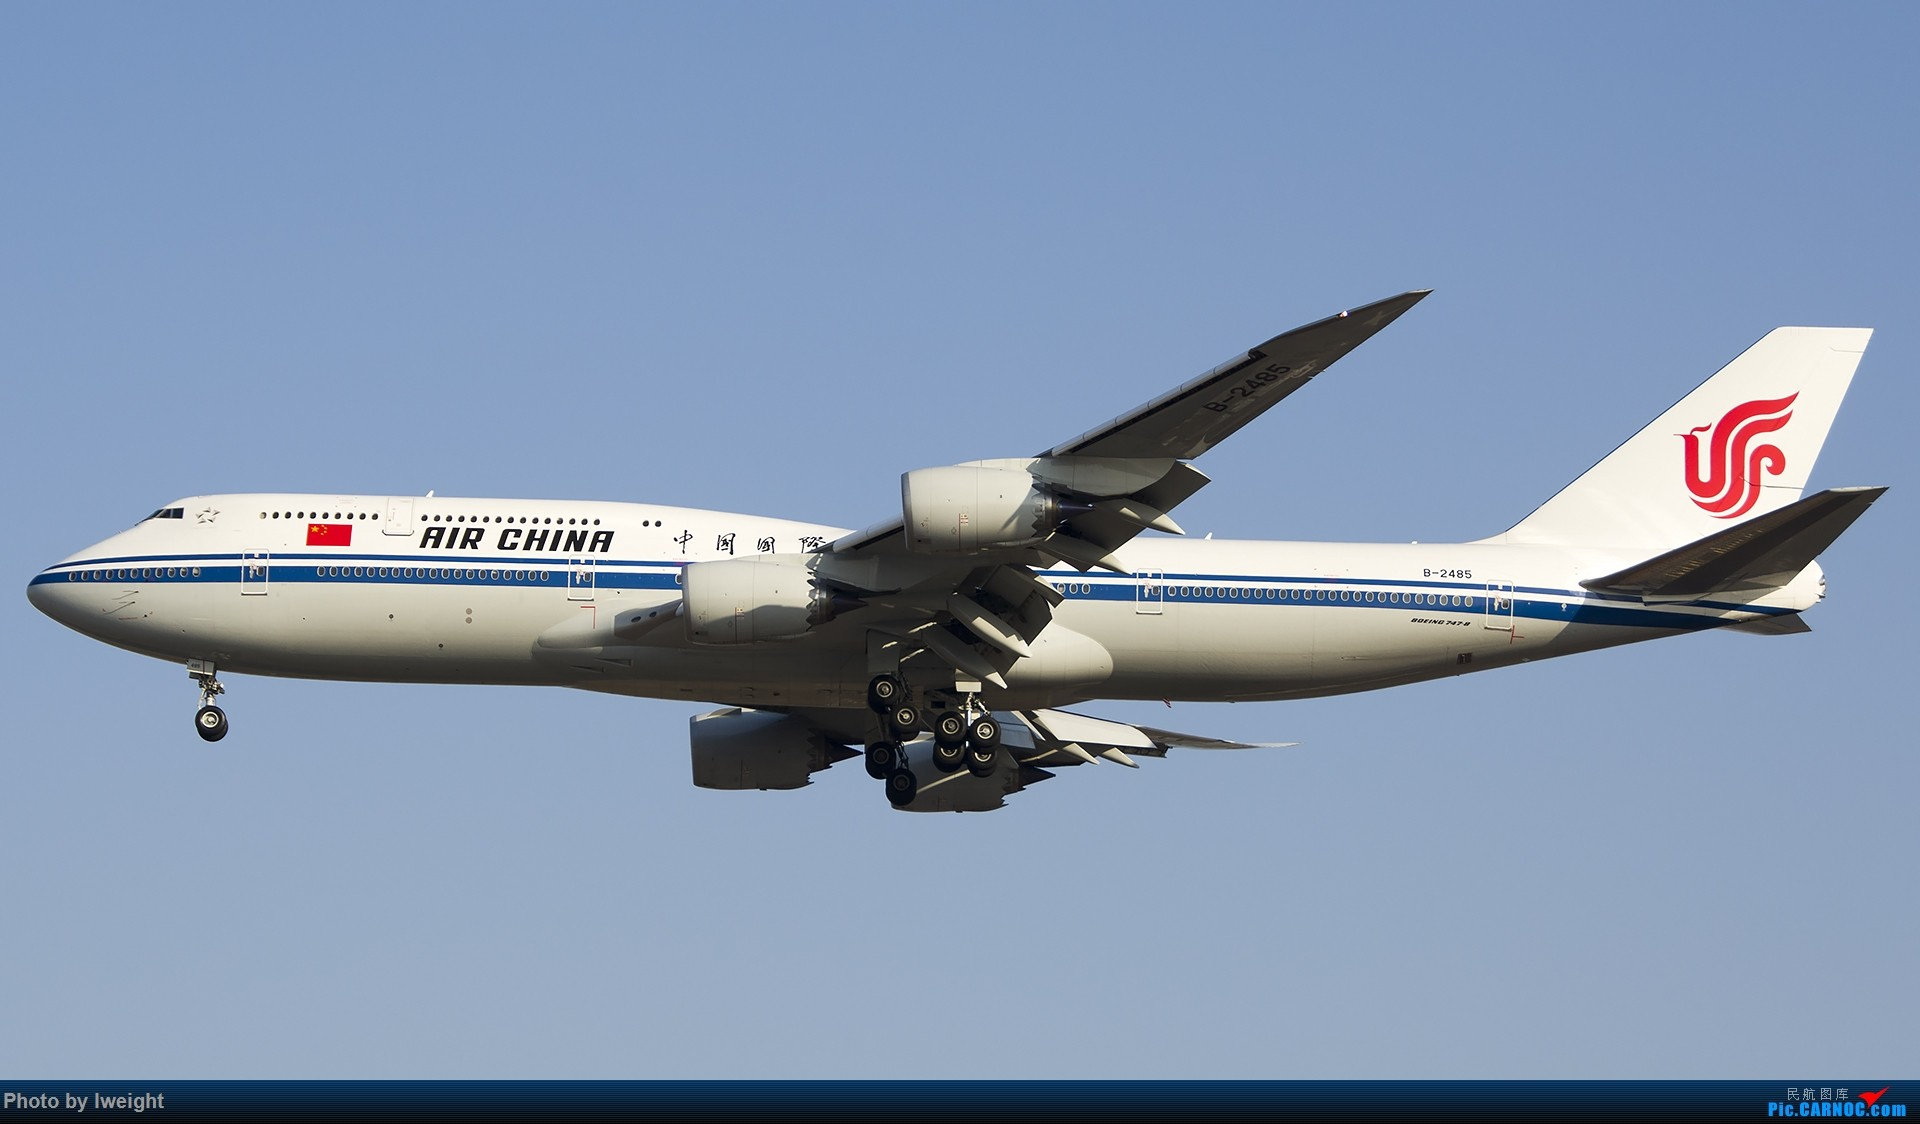 Re:[原创]2014-12-02 ZBAA随拍 BOEING 747-8I B-2485 中国北京首都国际机场